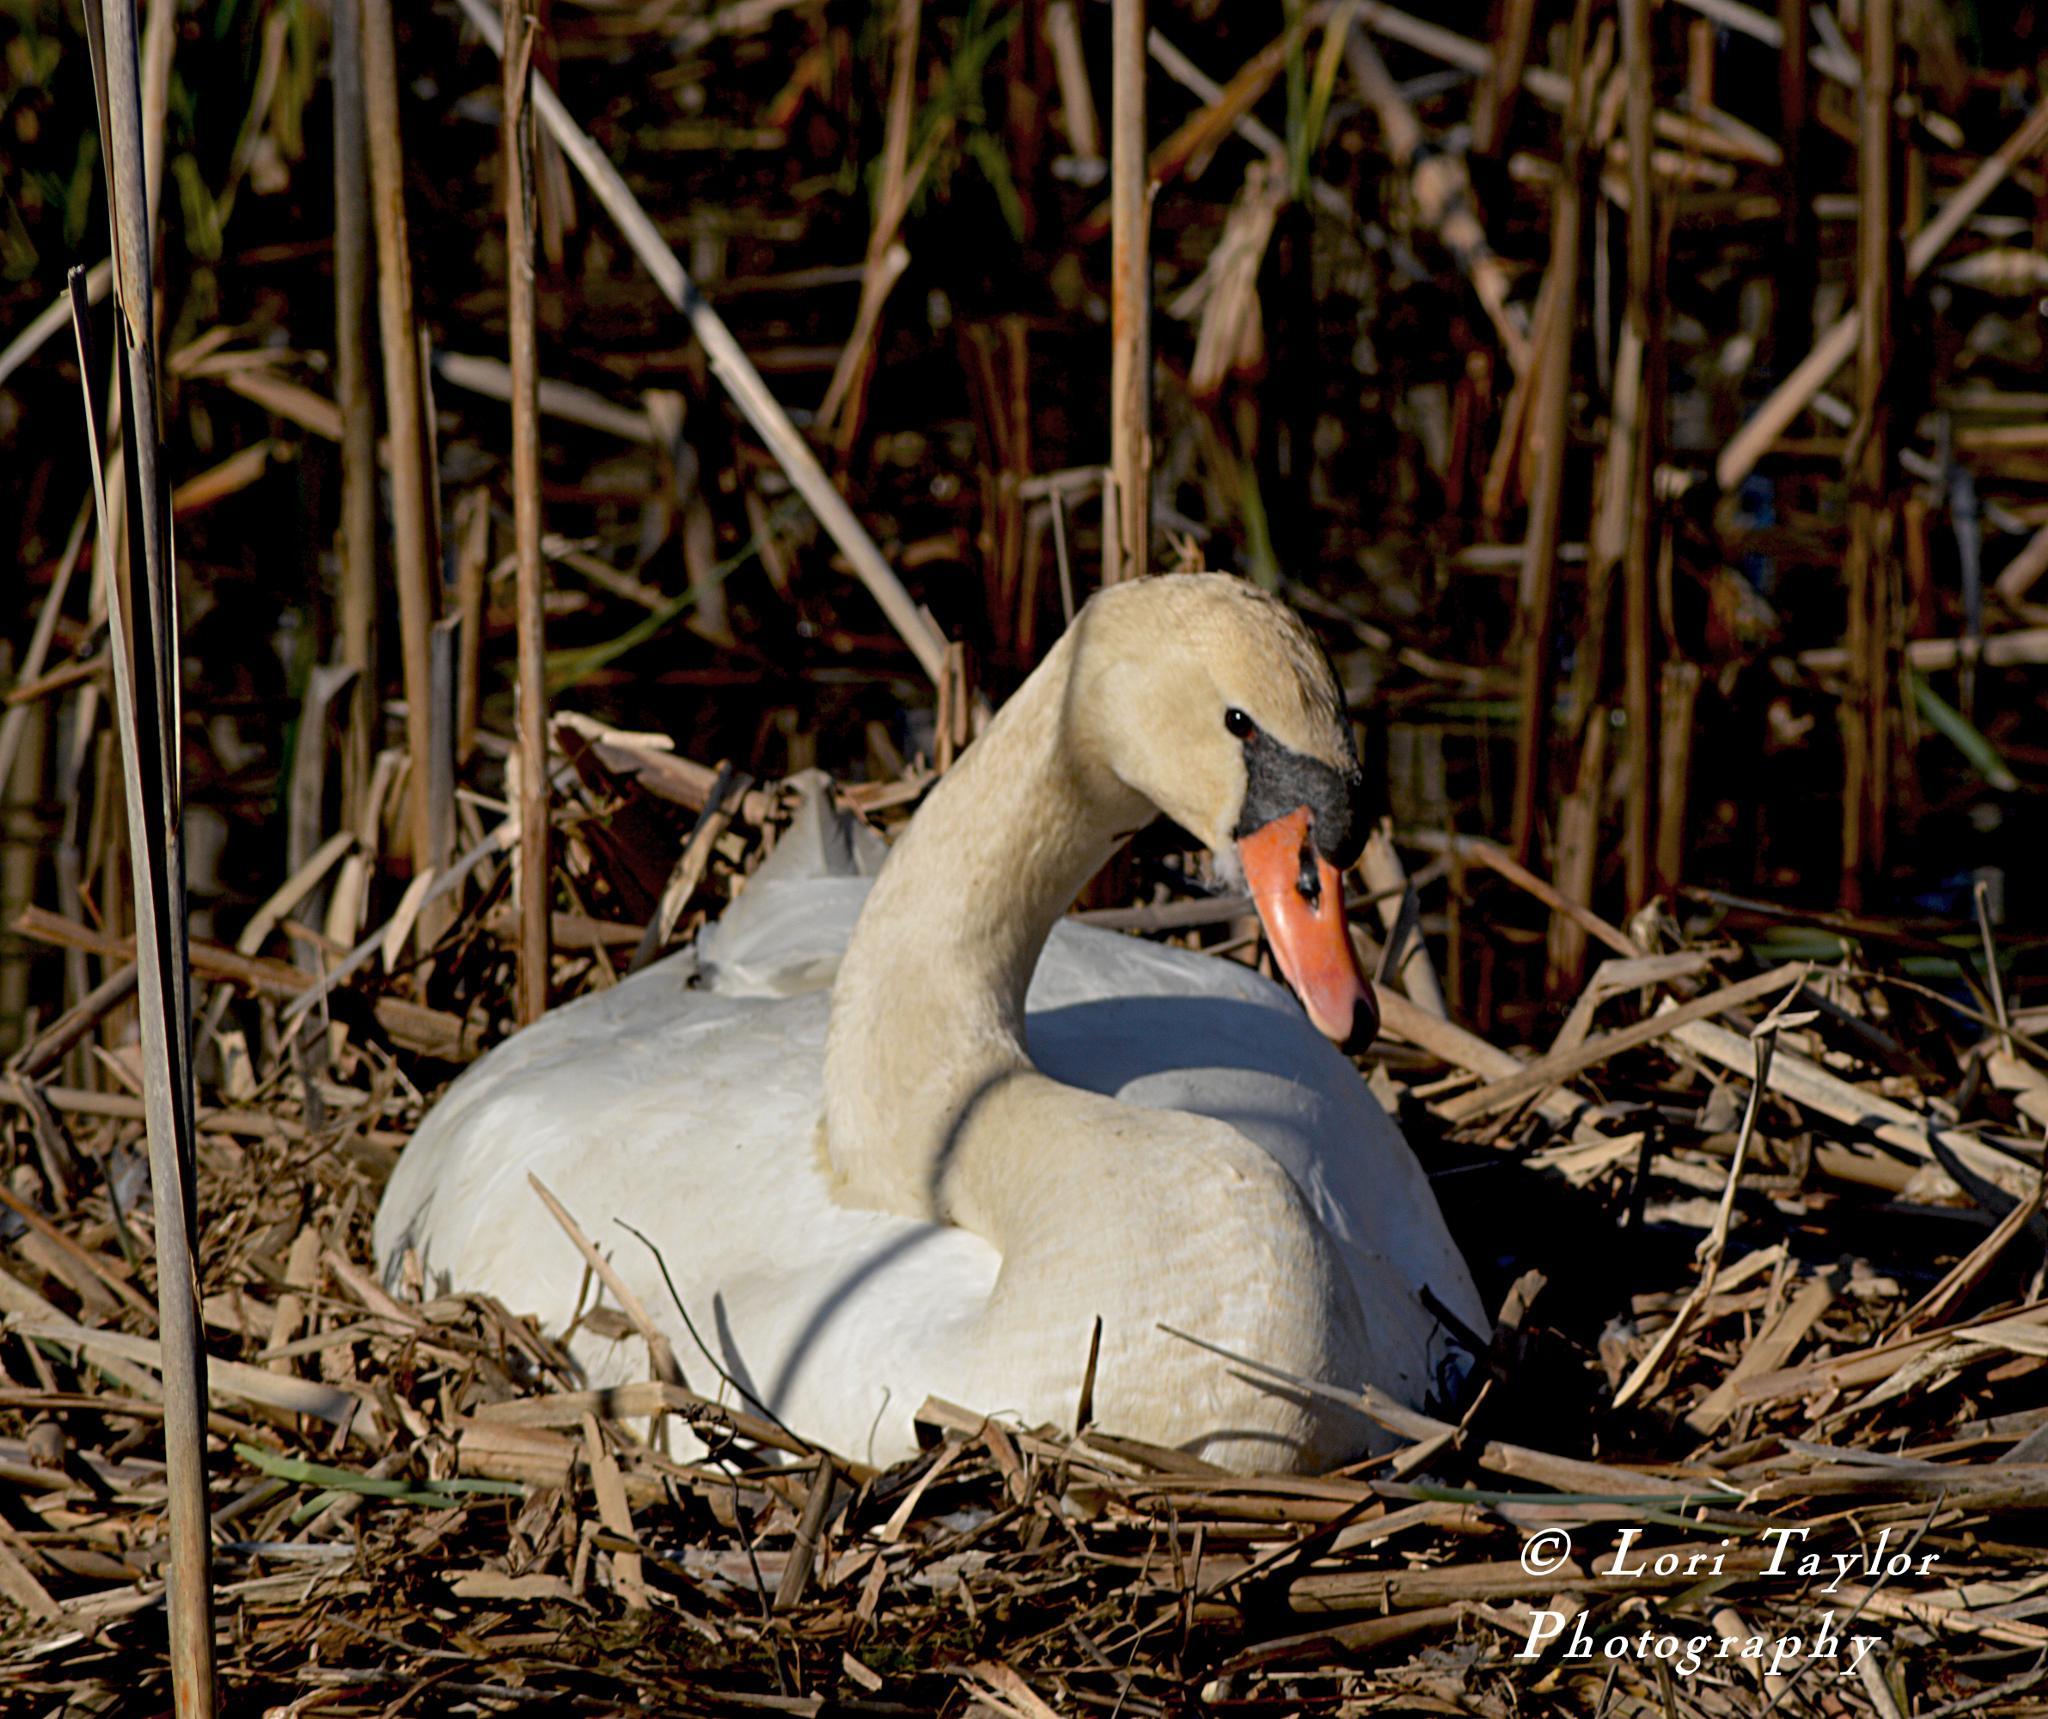 Swan nesting by Lori21929